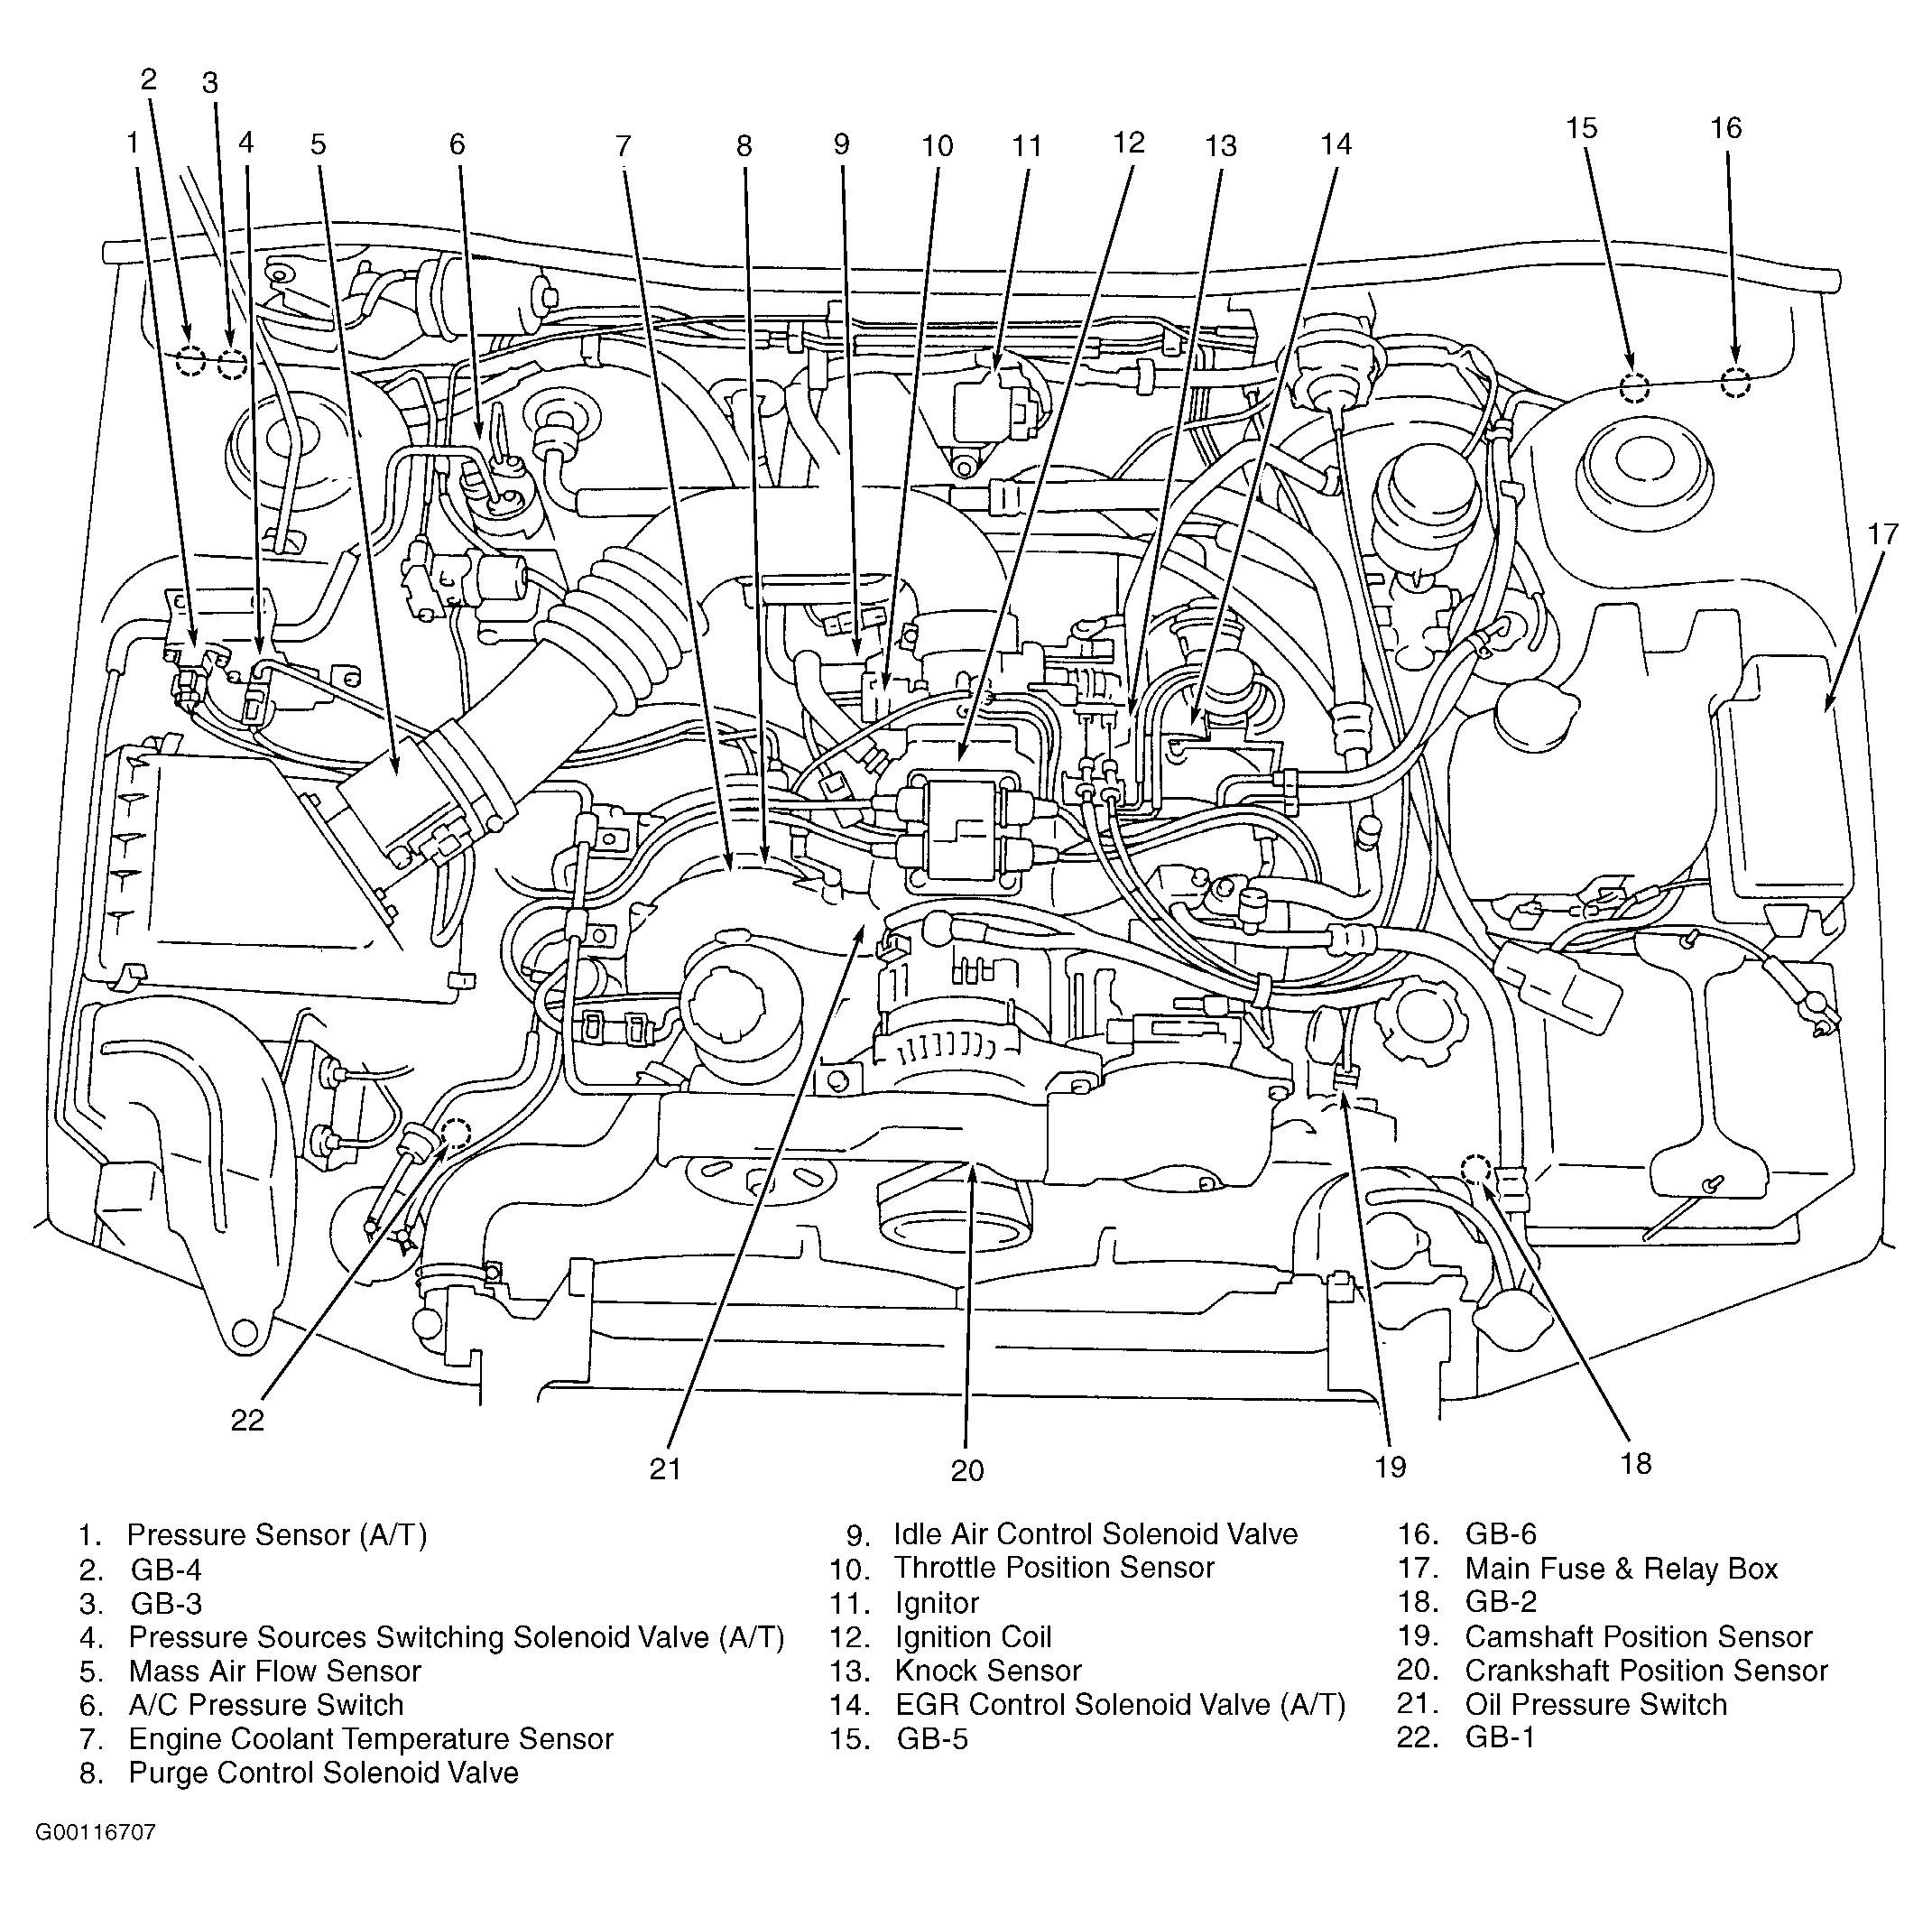 2009 Subaru Forester Engine Diagram Full Hd Quality Version Engine Diagram Flow Diagrams Discoclassic It